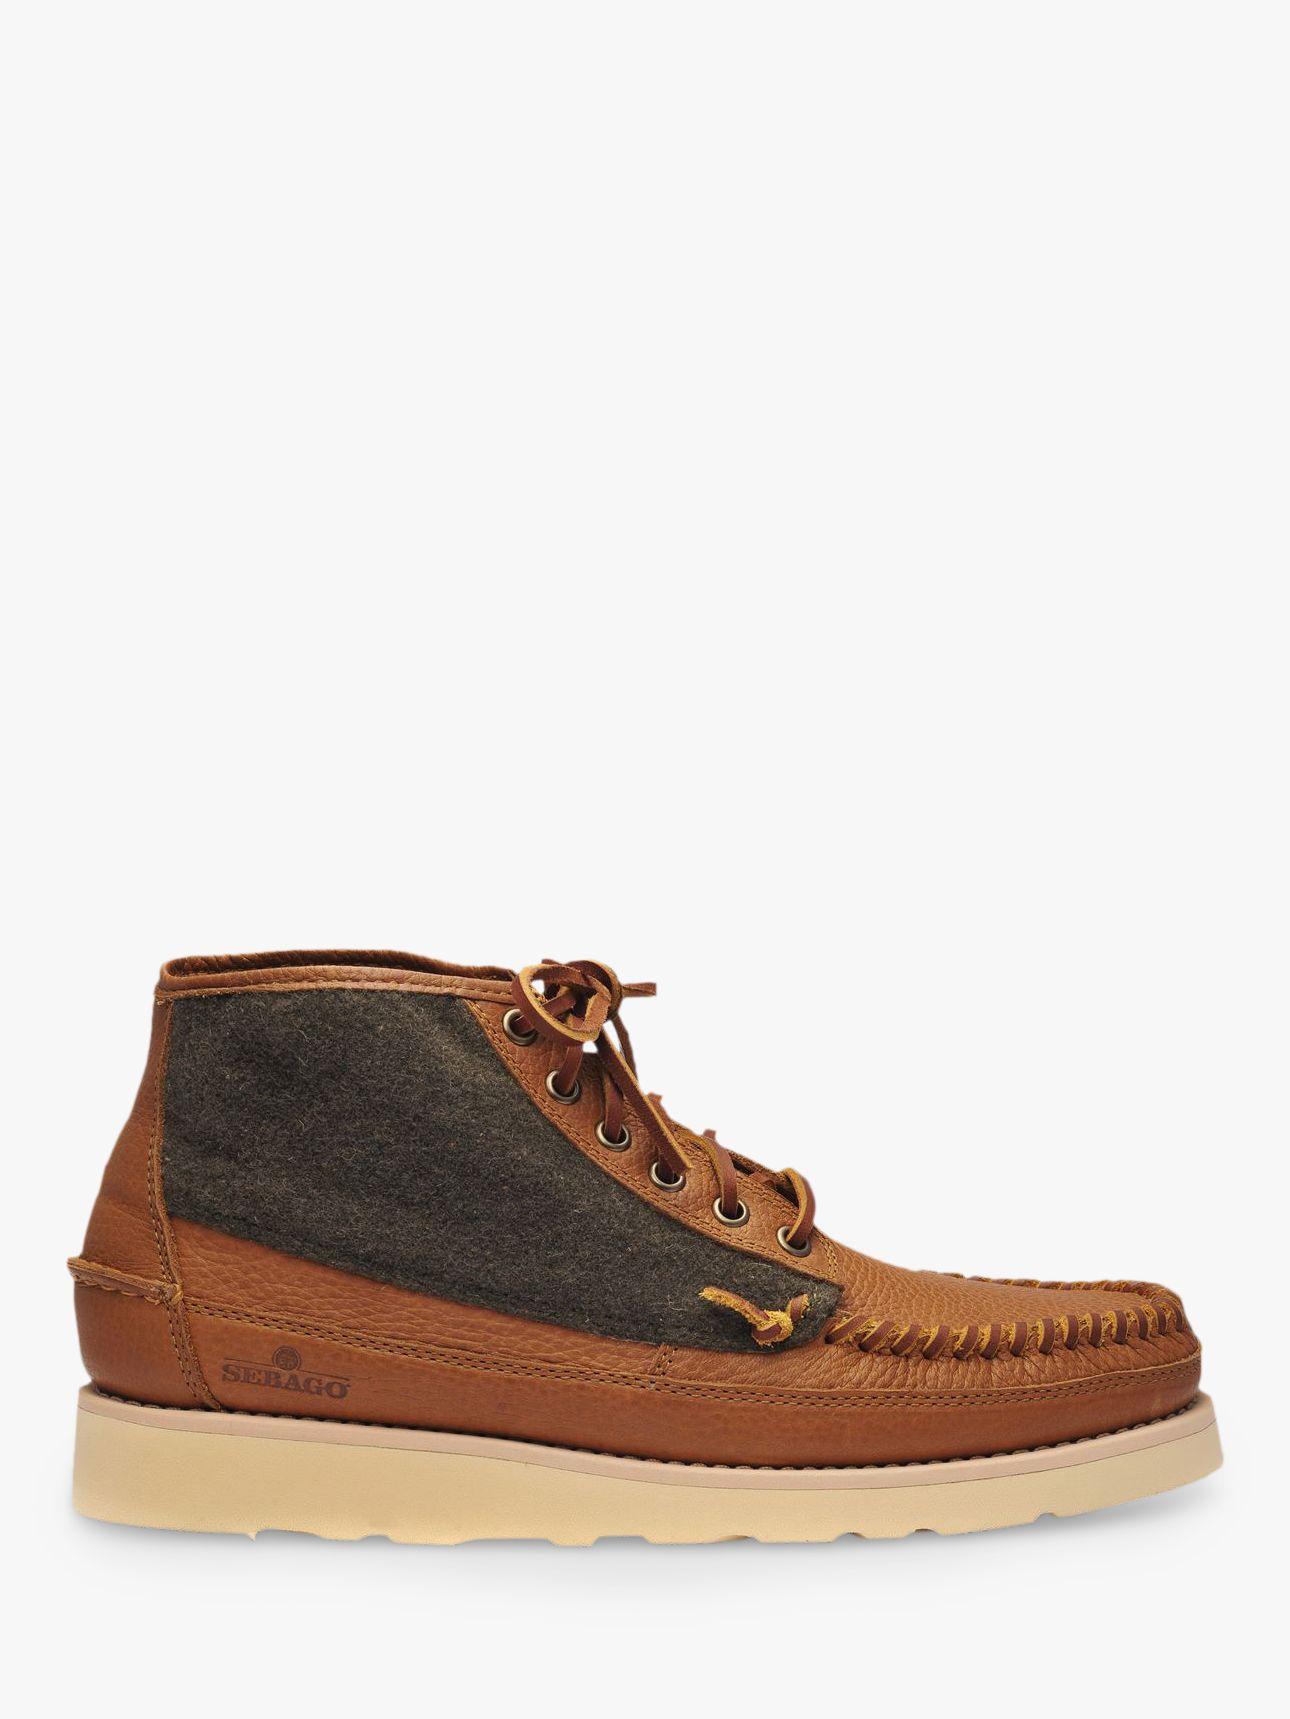 Sebago Sebago Campsides Seneca Mid Wool Moccasin Boots, Brown/Green